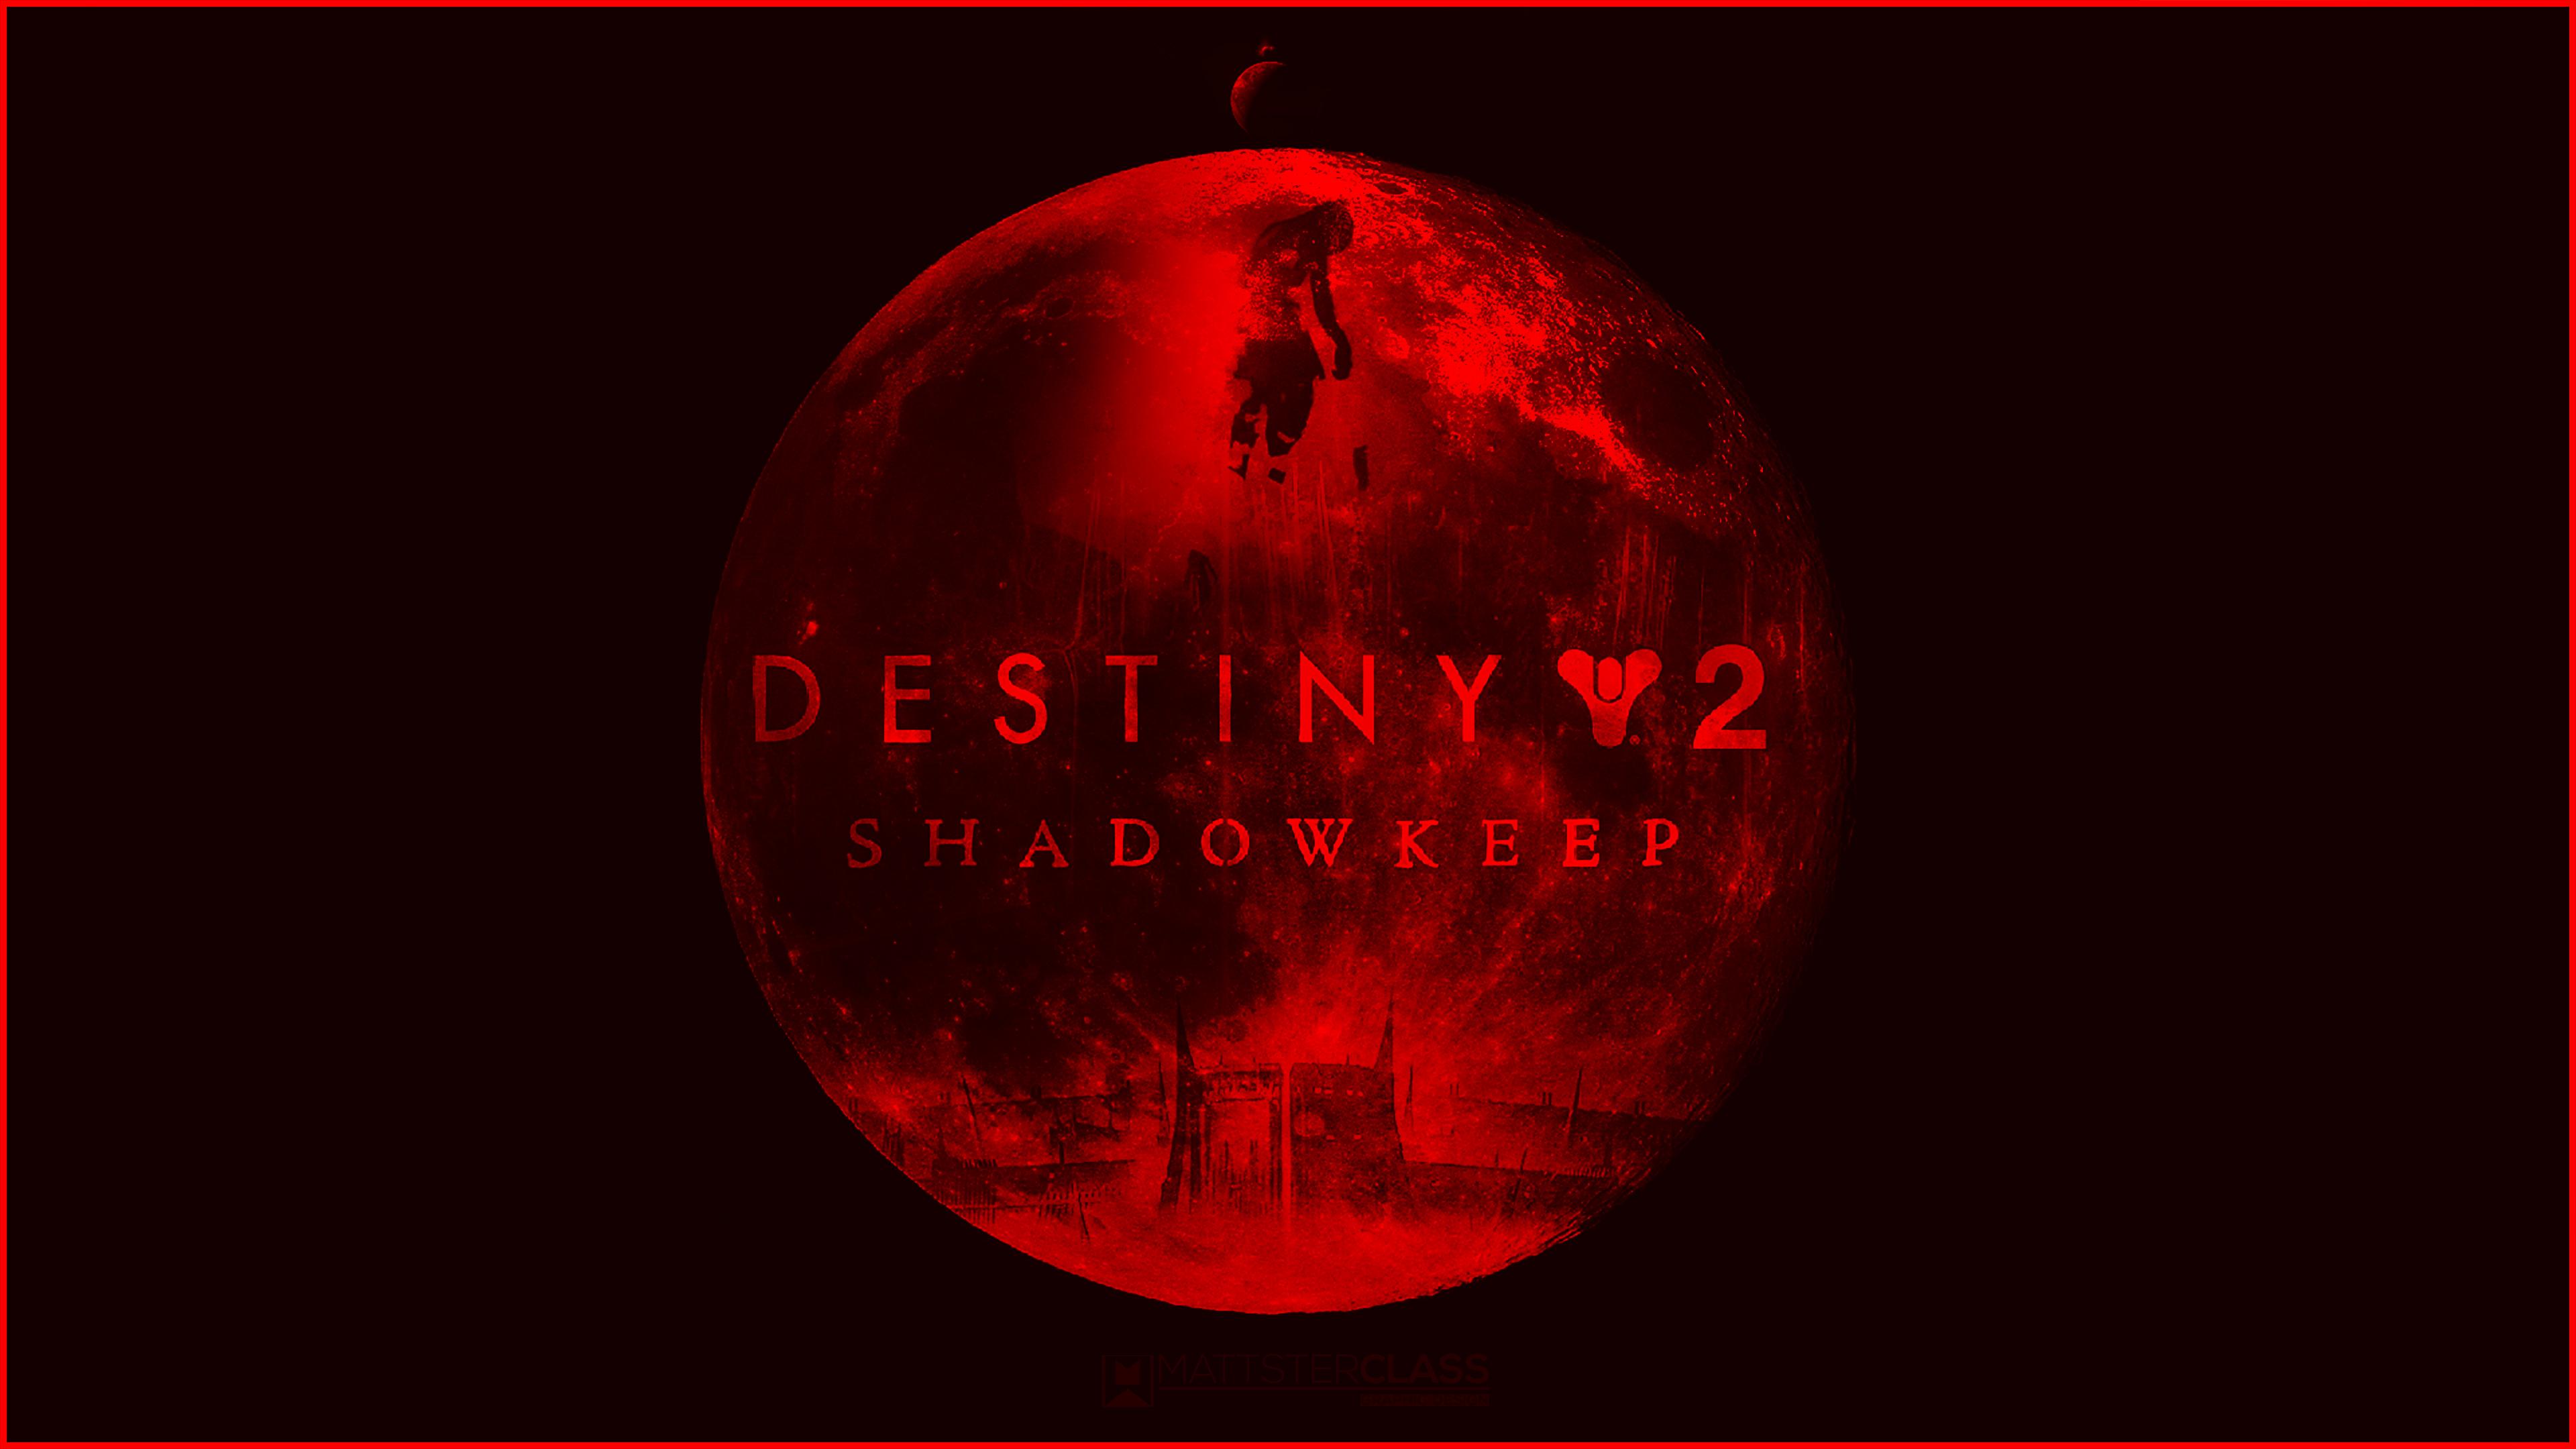 Destiny 2 Shadowkeep Wallpapers Wallpaper Cave